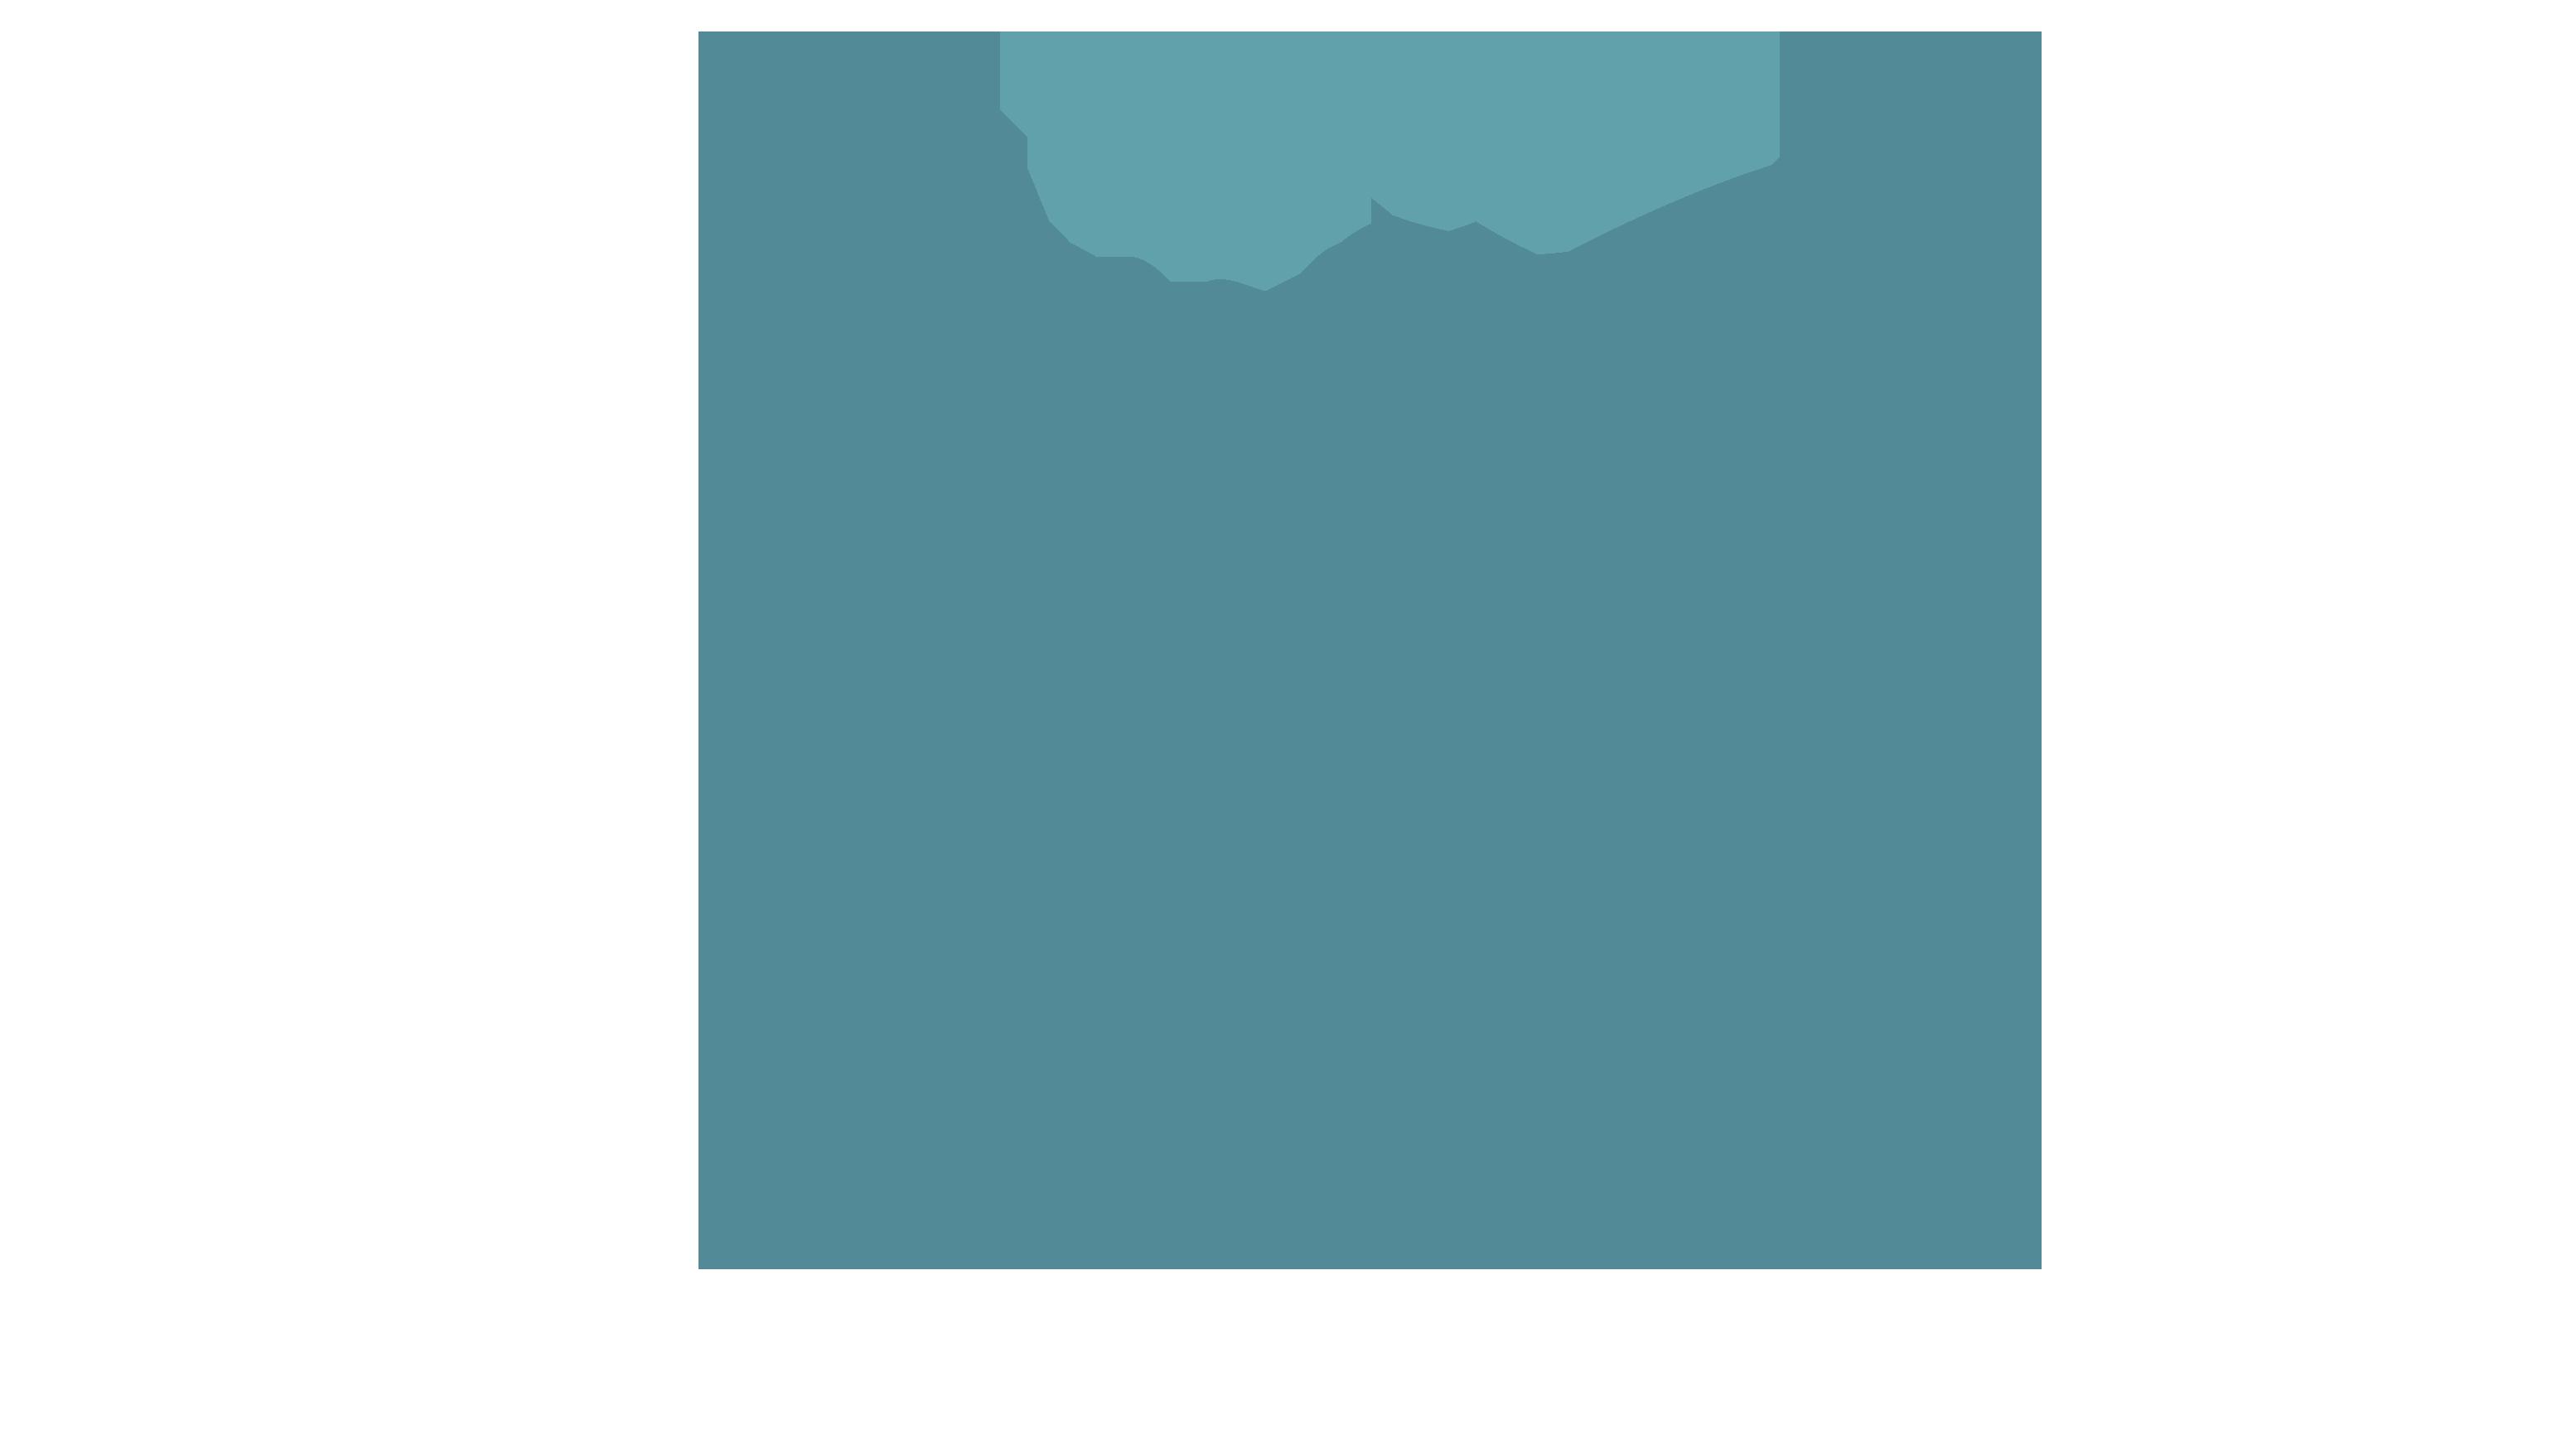 snorken_illustration